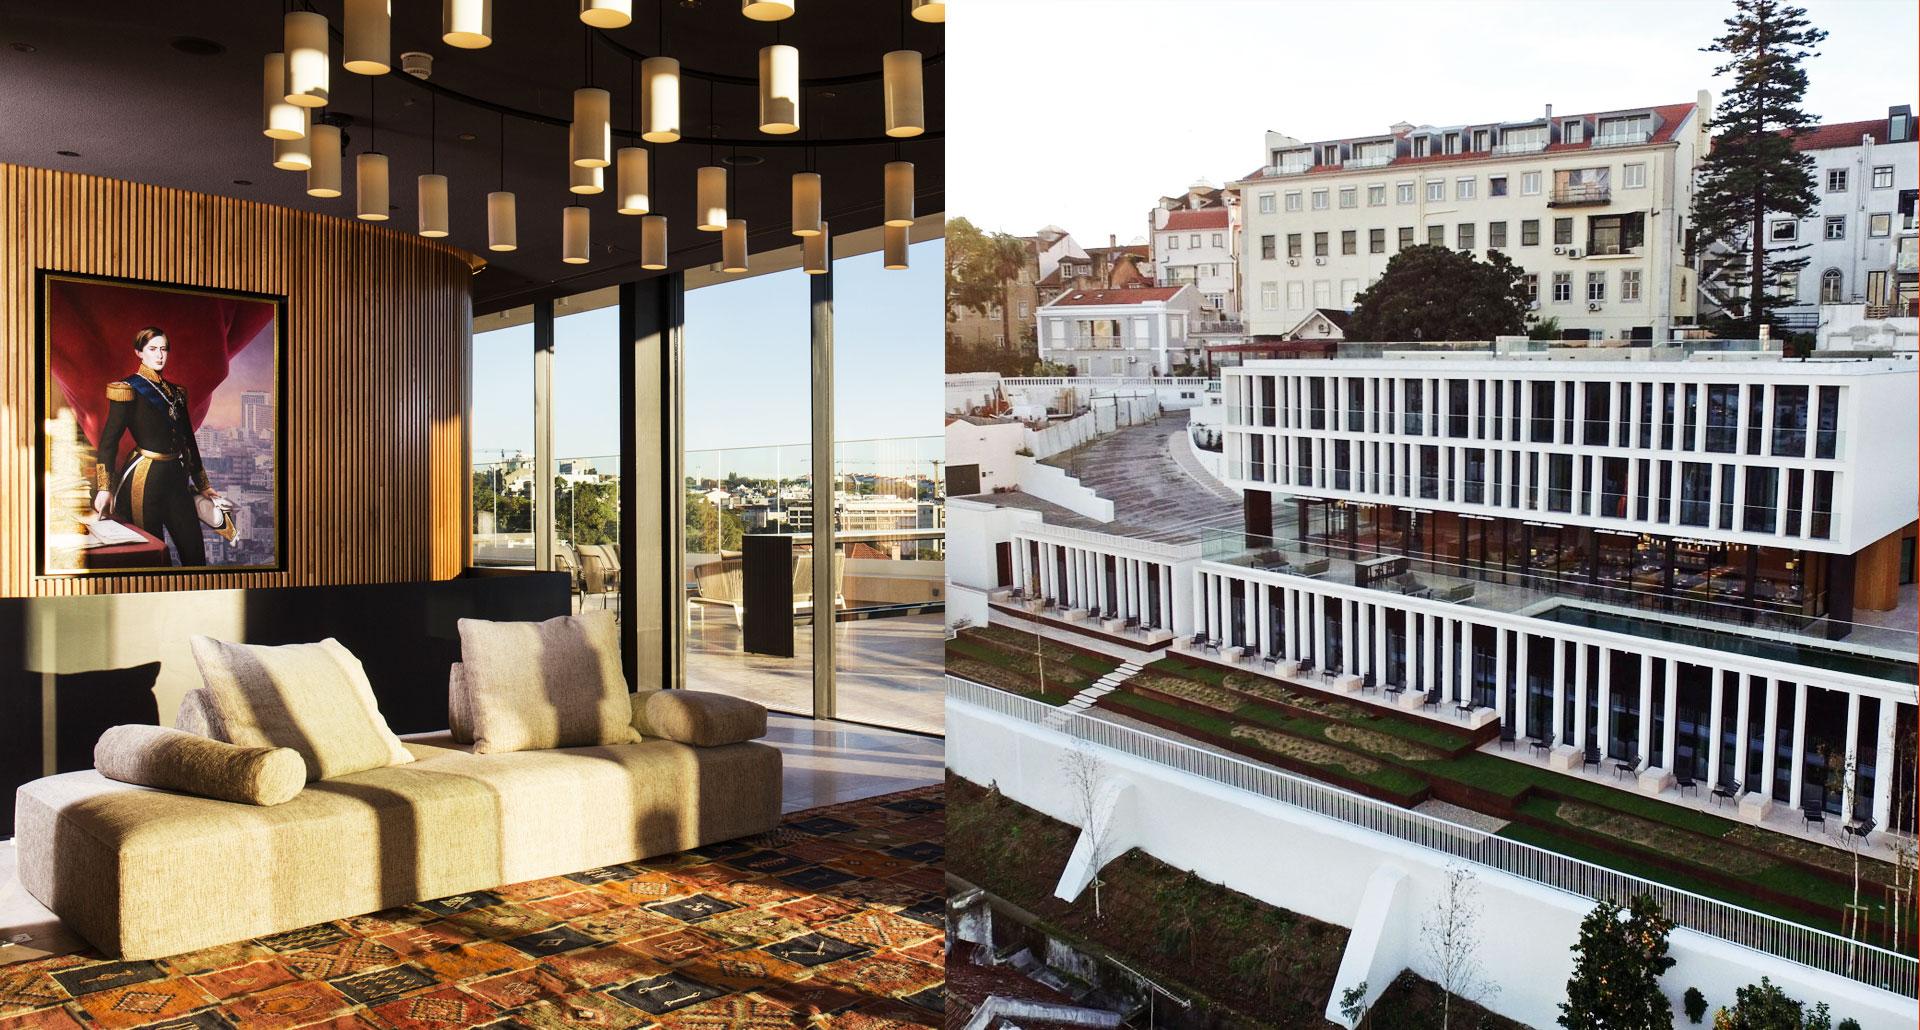 Memmo Principe Real Hotel Lisboa - boutique hotel in Lisbon